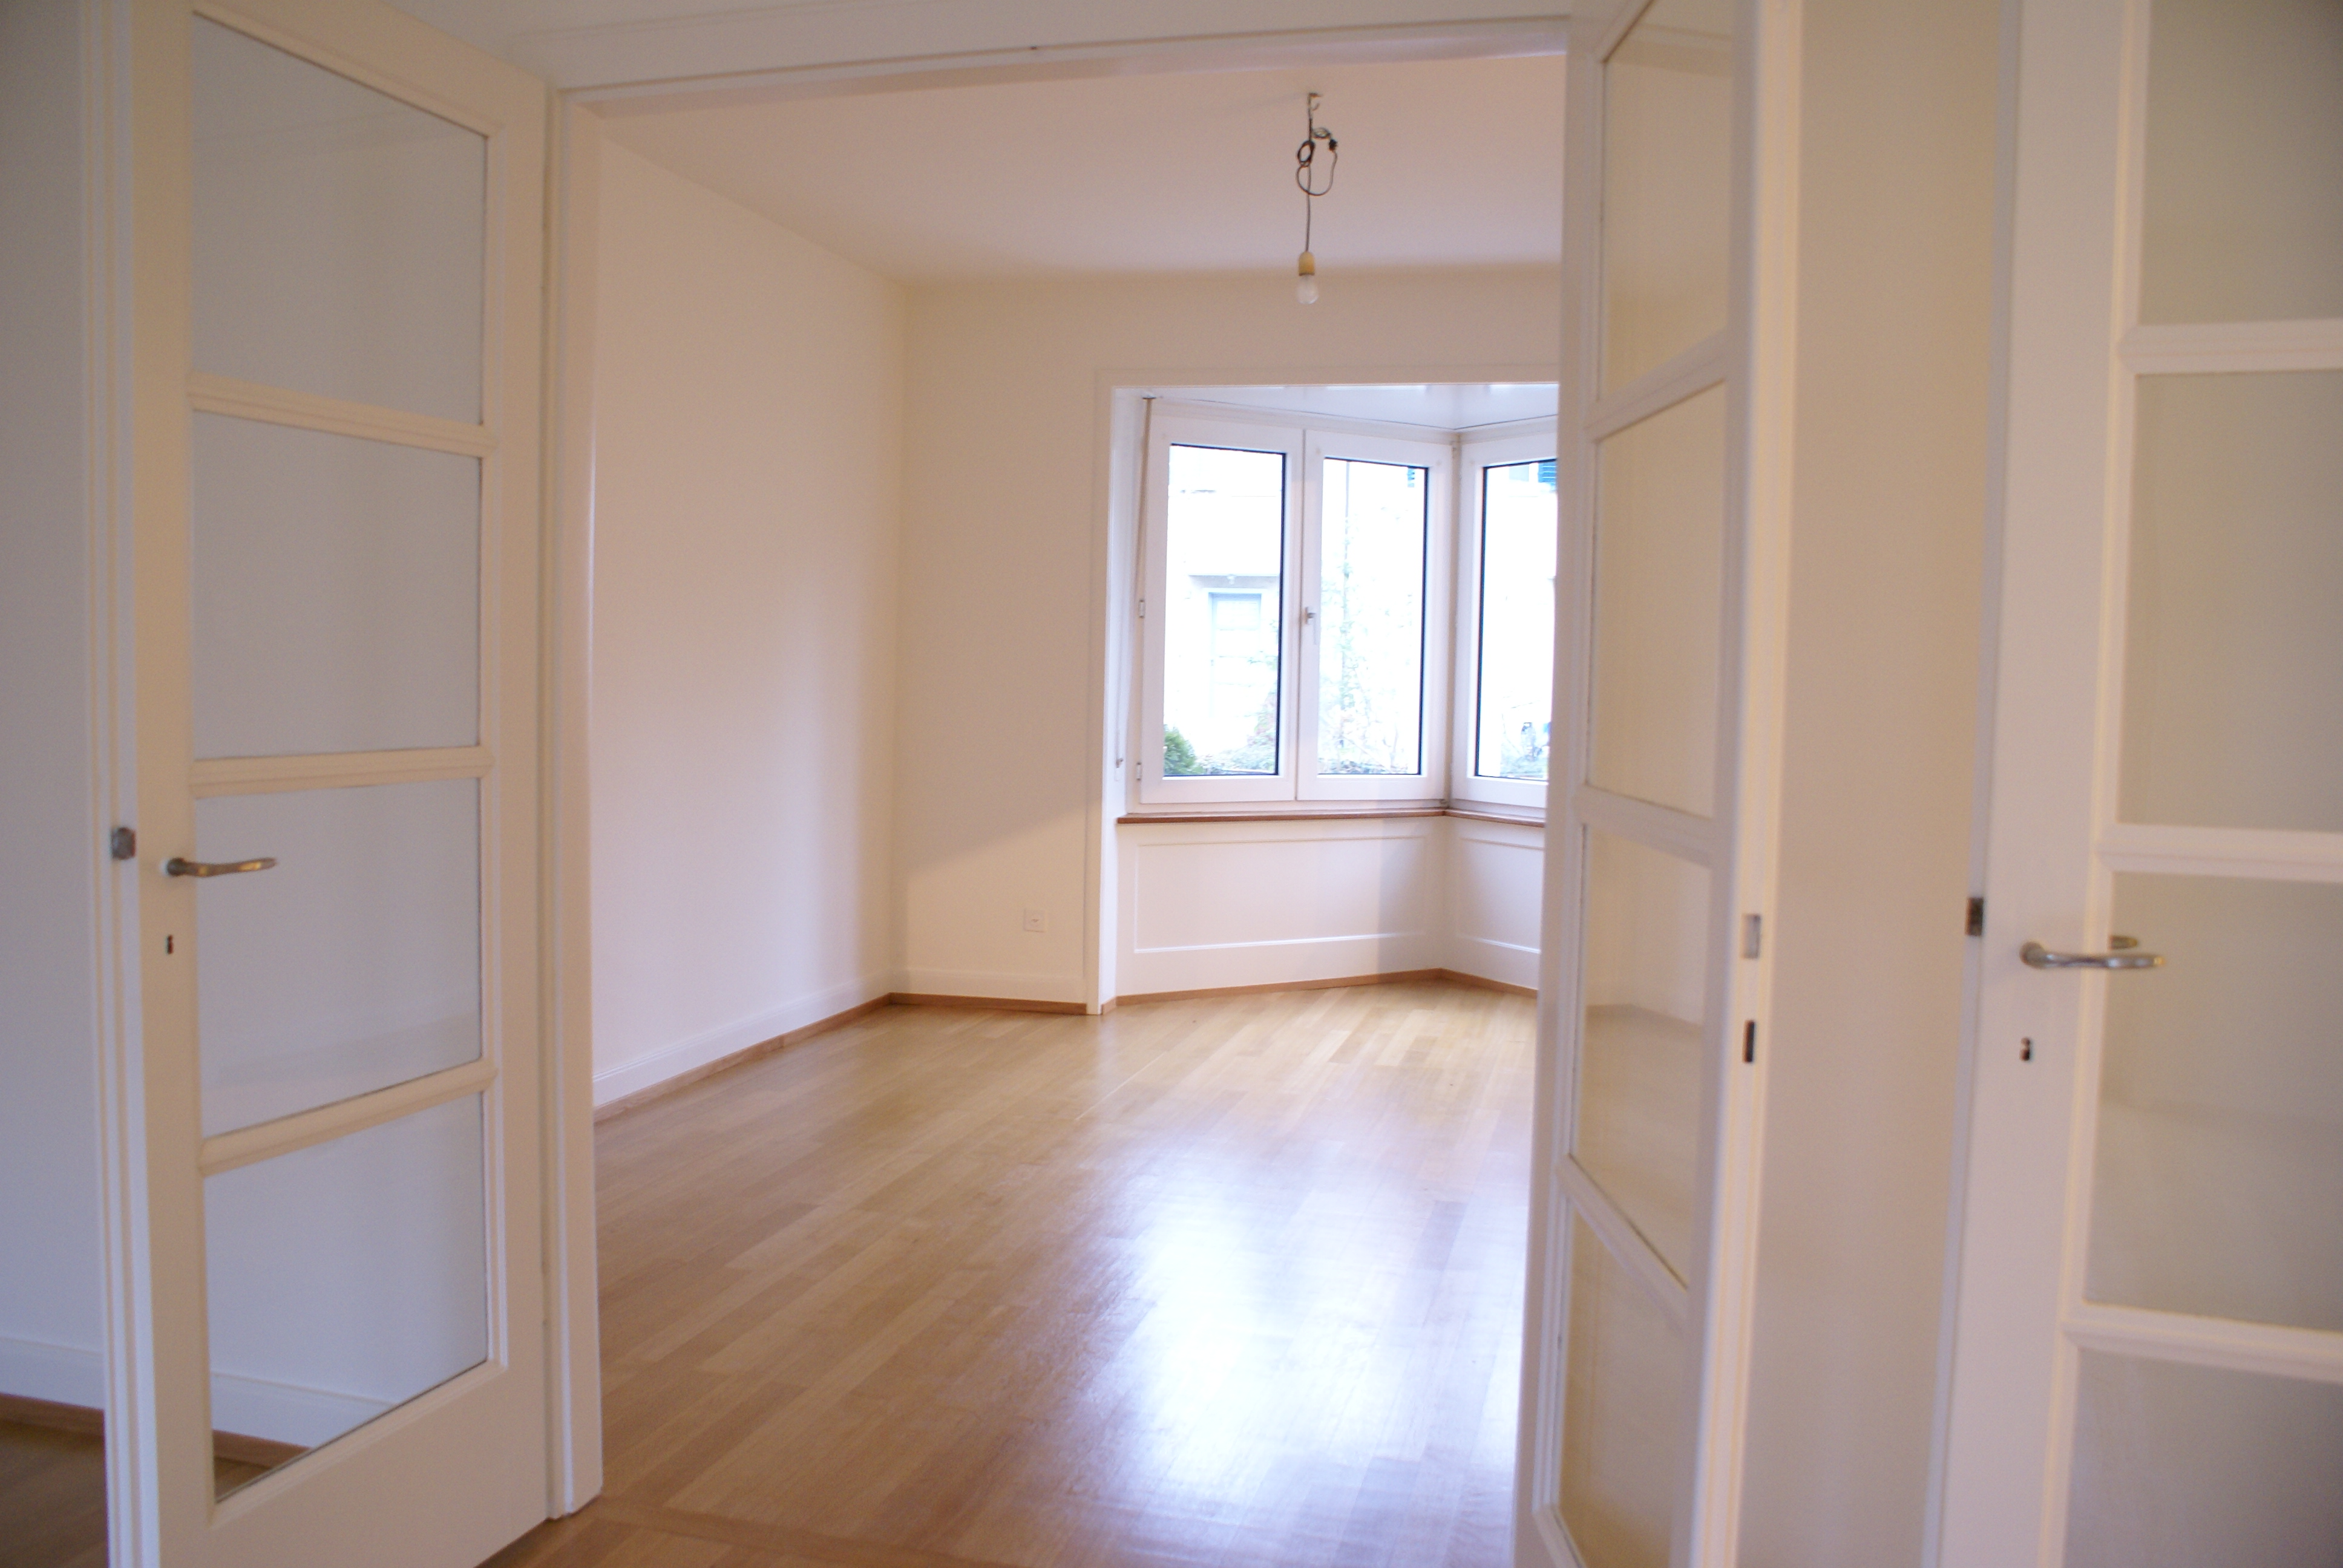 7,5 Zimmer-EFH in Basel-Bruderholz (zu vermieten)